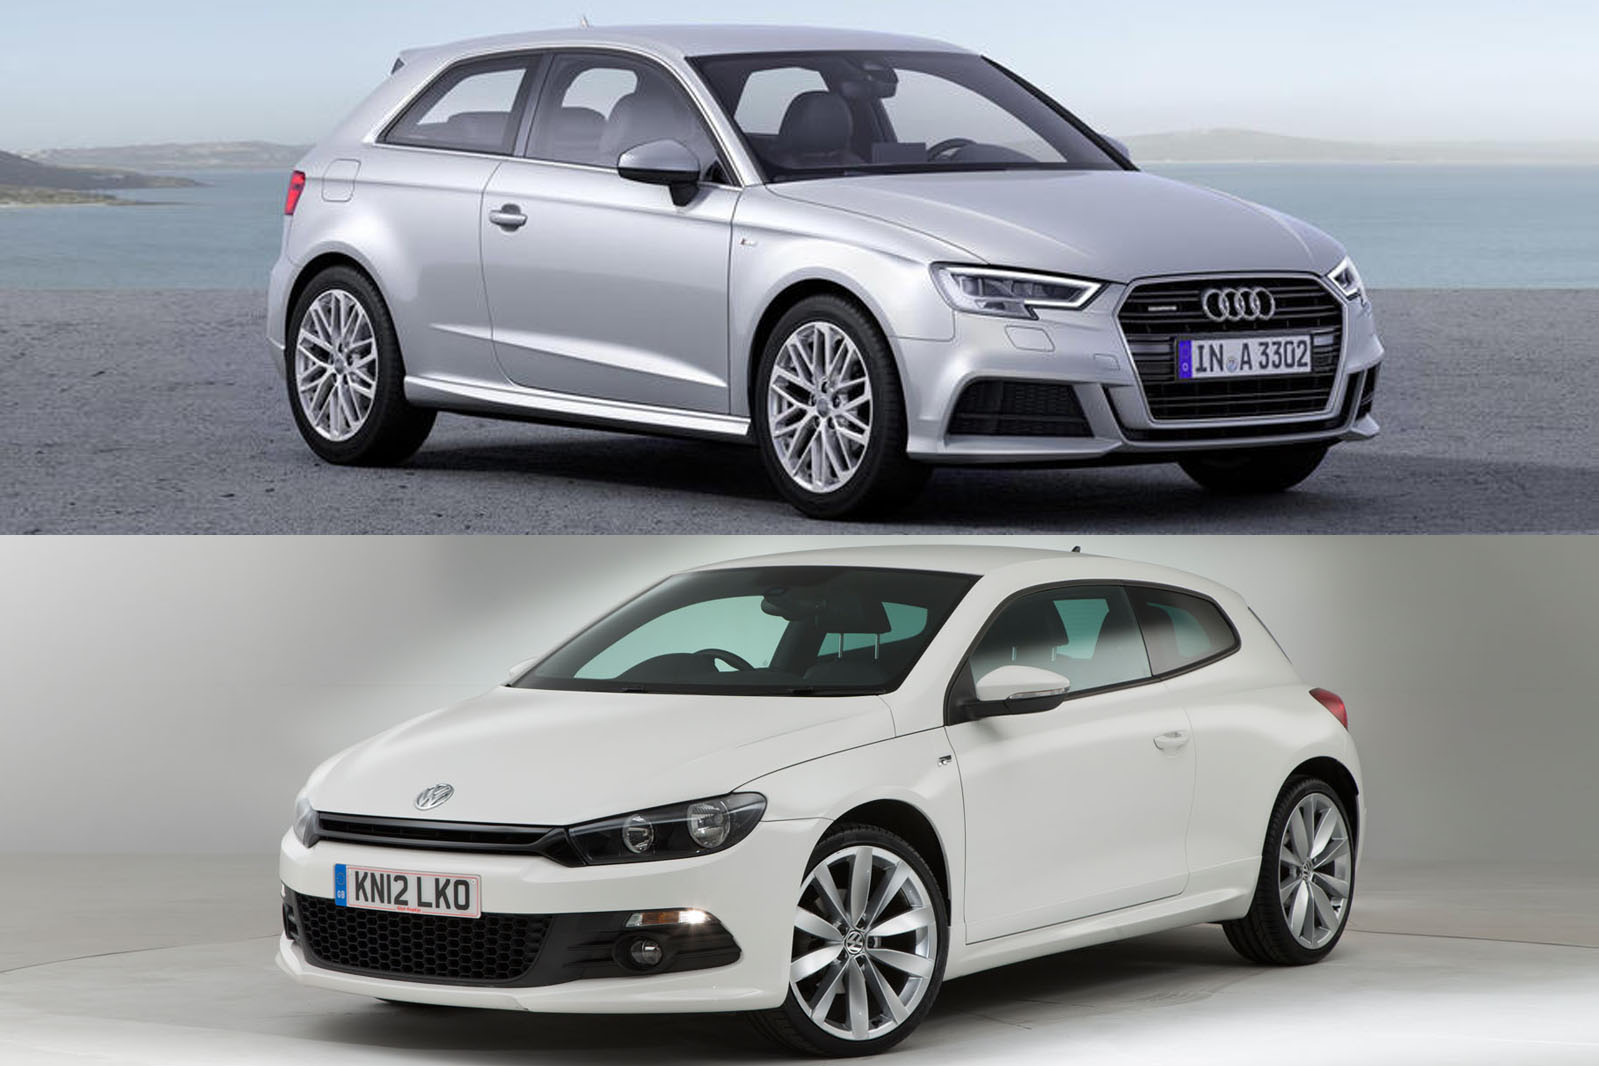 Kelebihan Audi Volkswagen Perbandingan Harga